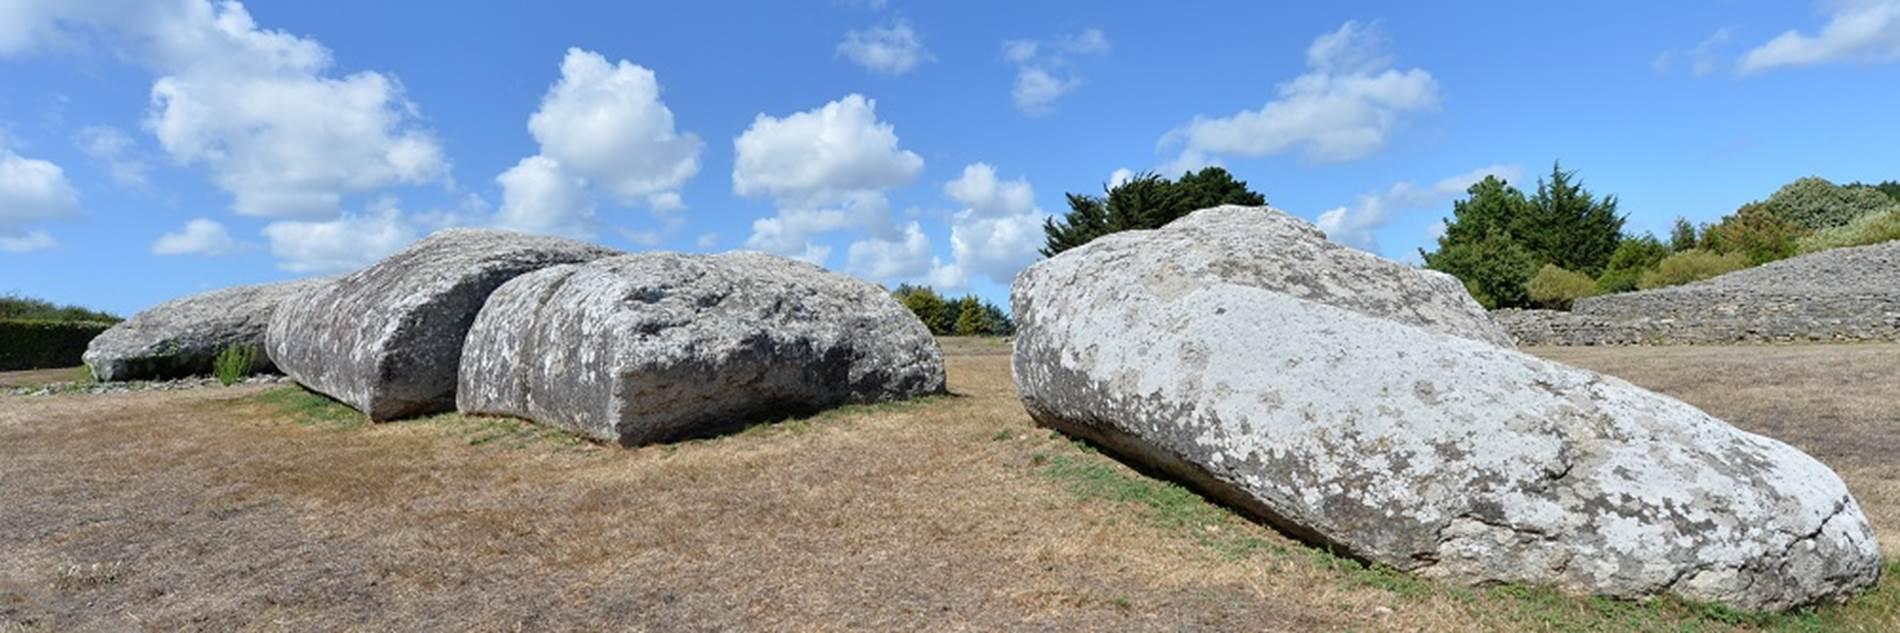 Site-des-megalithes-de-Locmariaquer-Morbihan-Bretagne-Sud ©